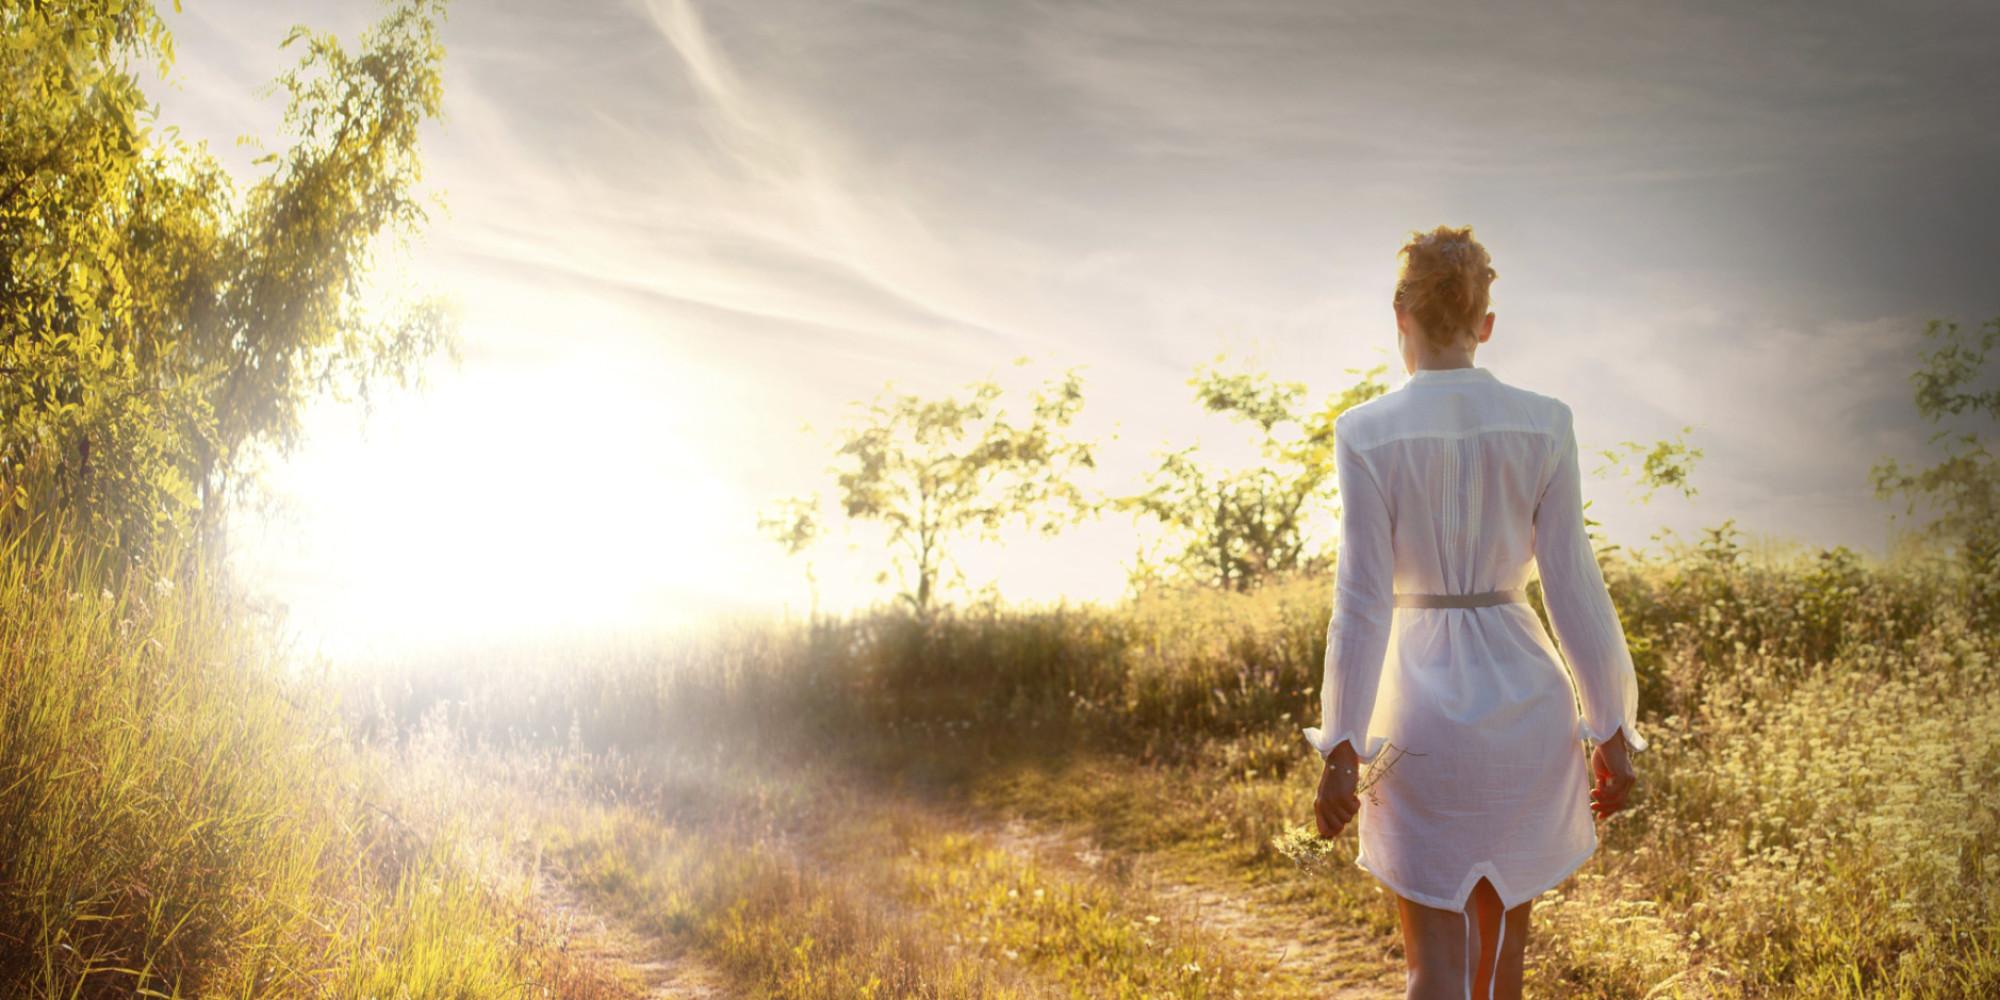 Meditation in general practice